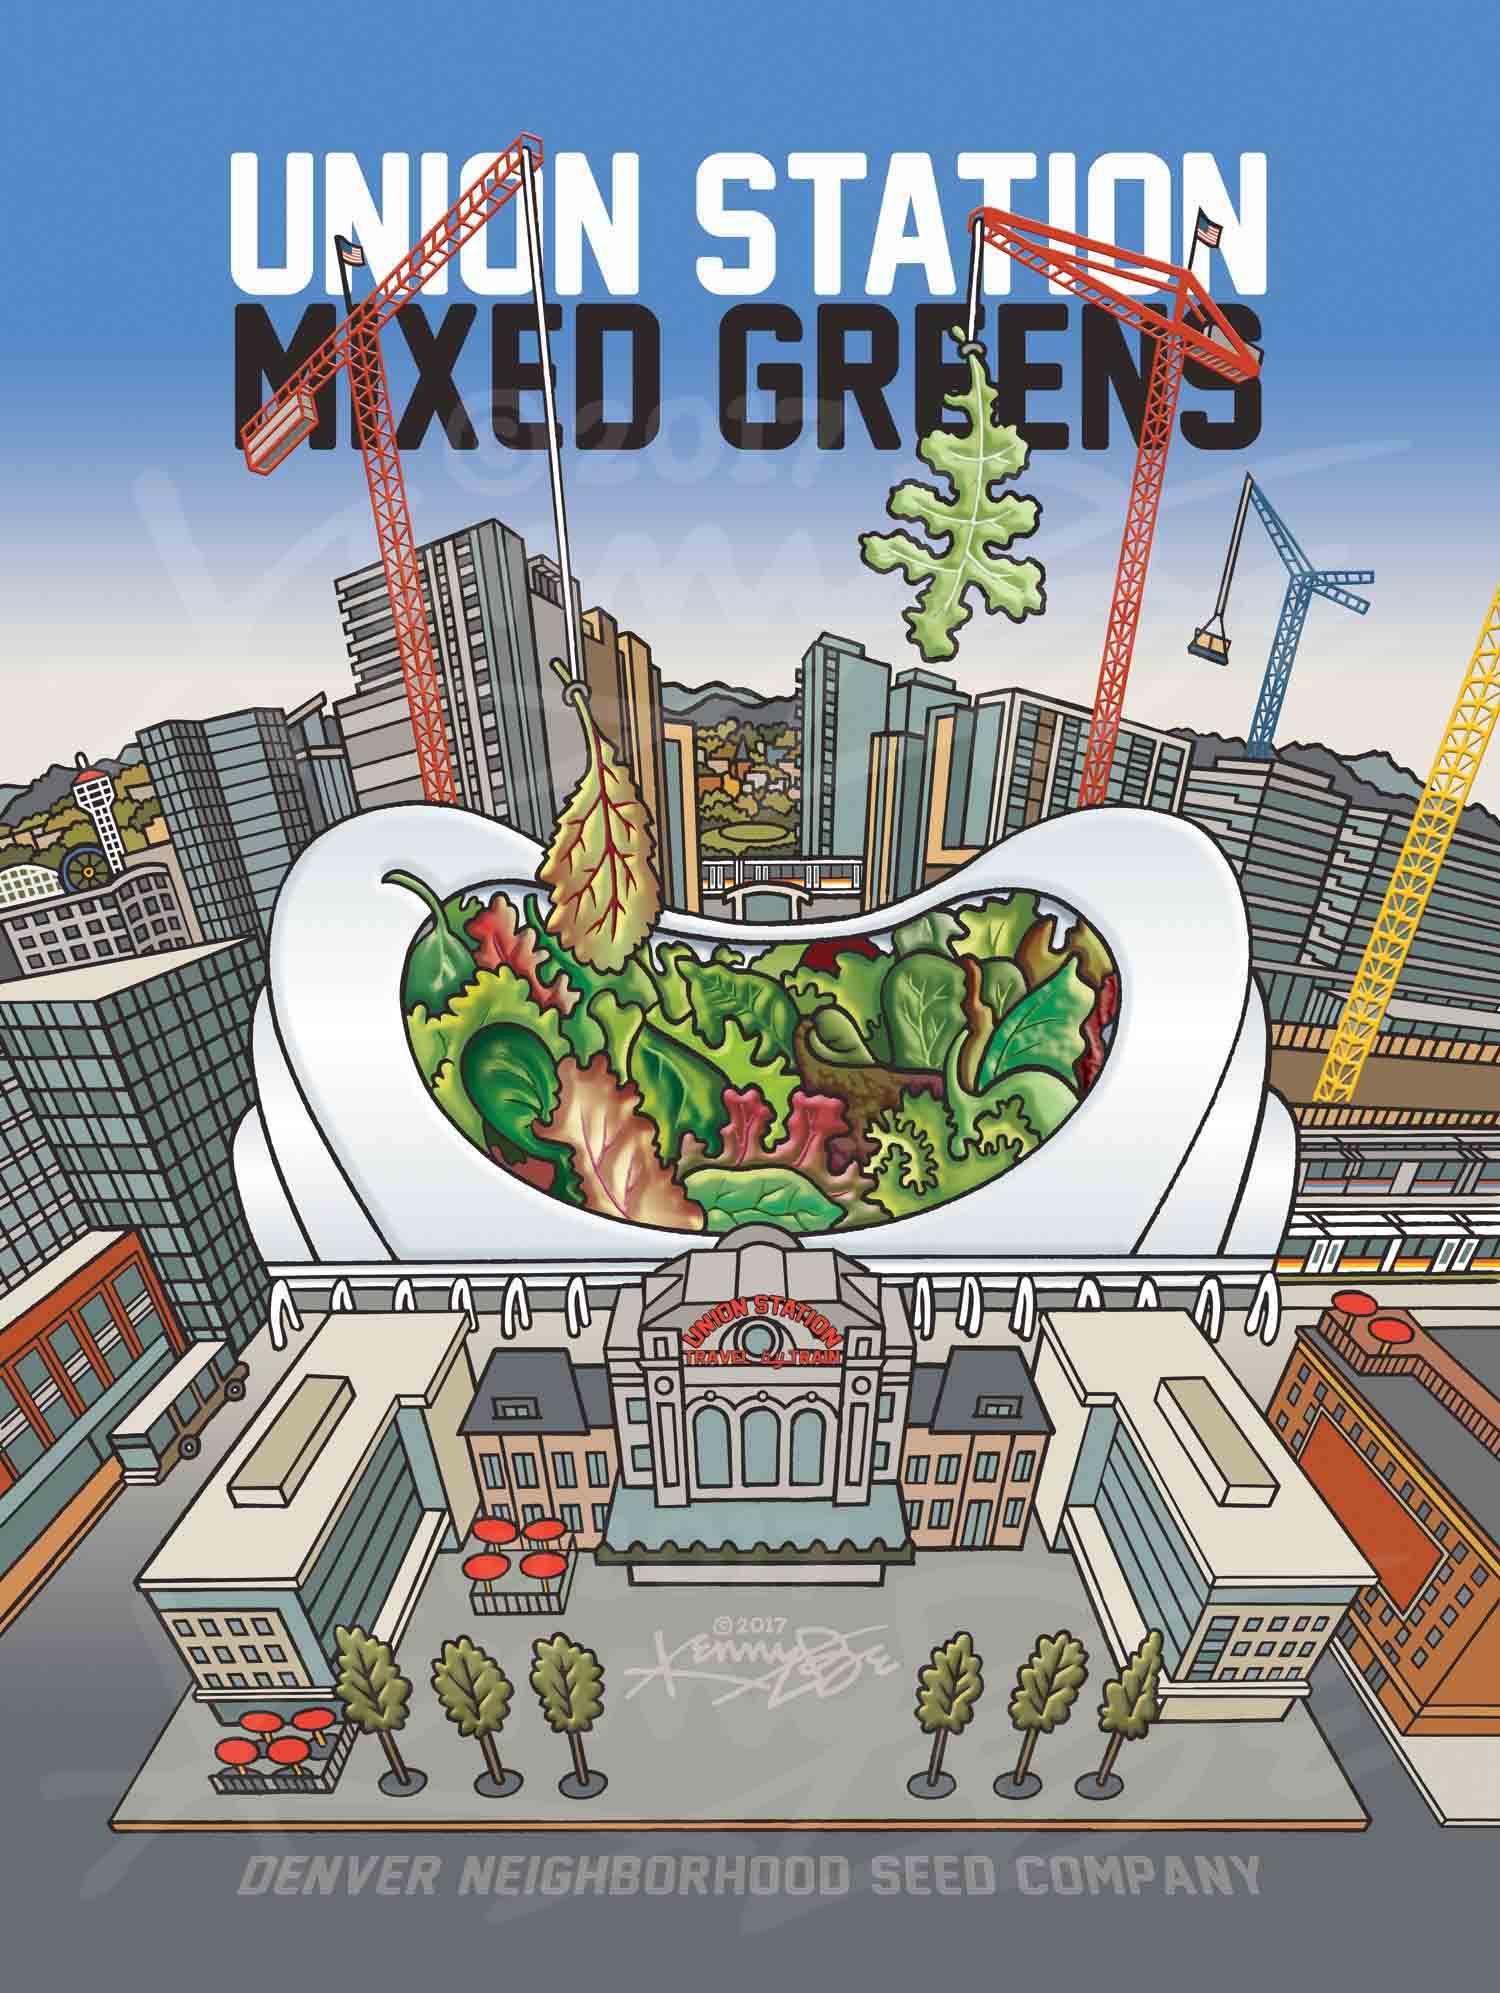 5. Union Station Mixed Greens Denver Neighborhood Seed Company Kenny Be Art & Design kennybe.com Color Art.jpg